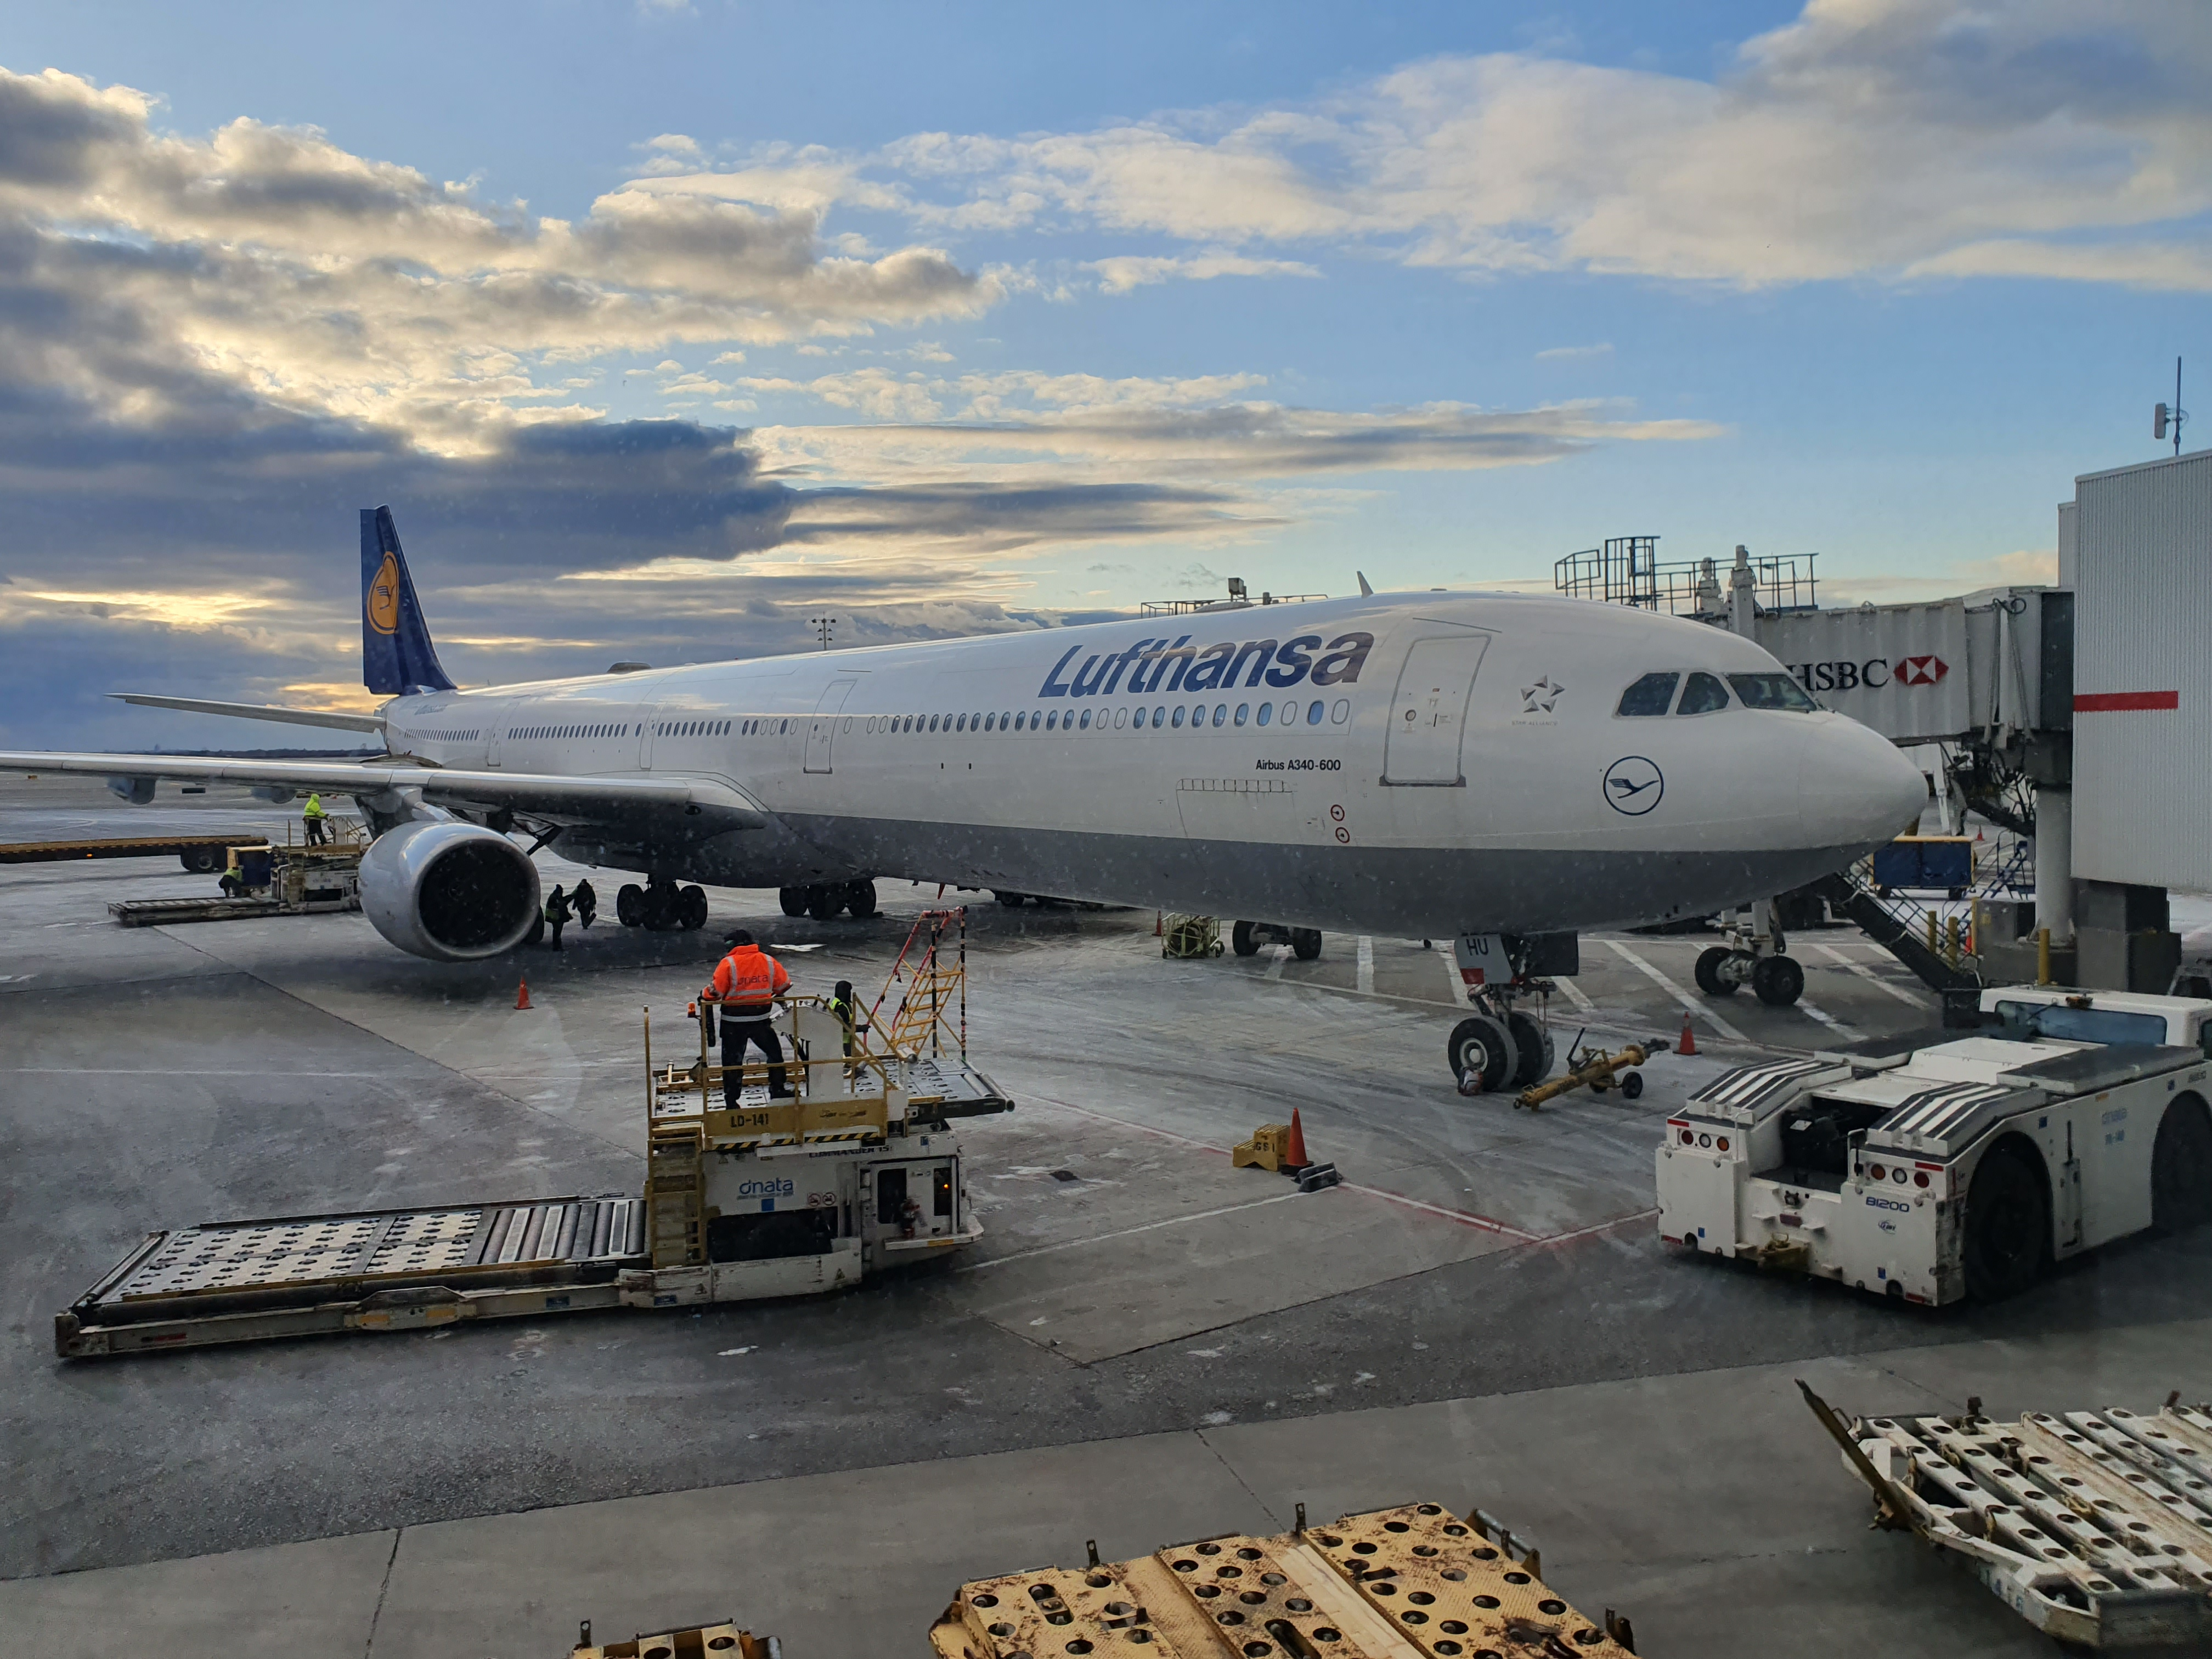 Lufthansa Customer Reviews | SKYTRAX